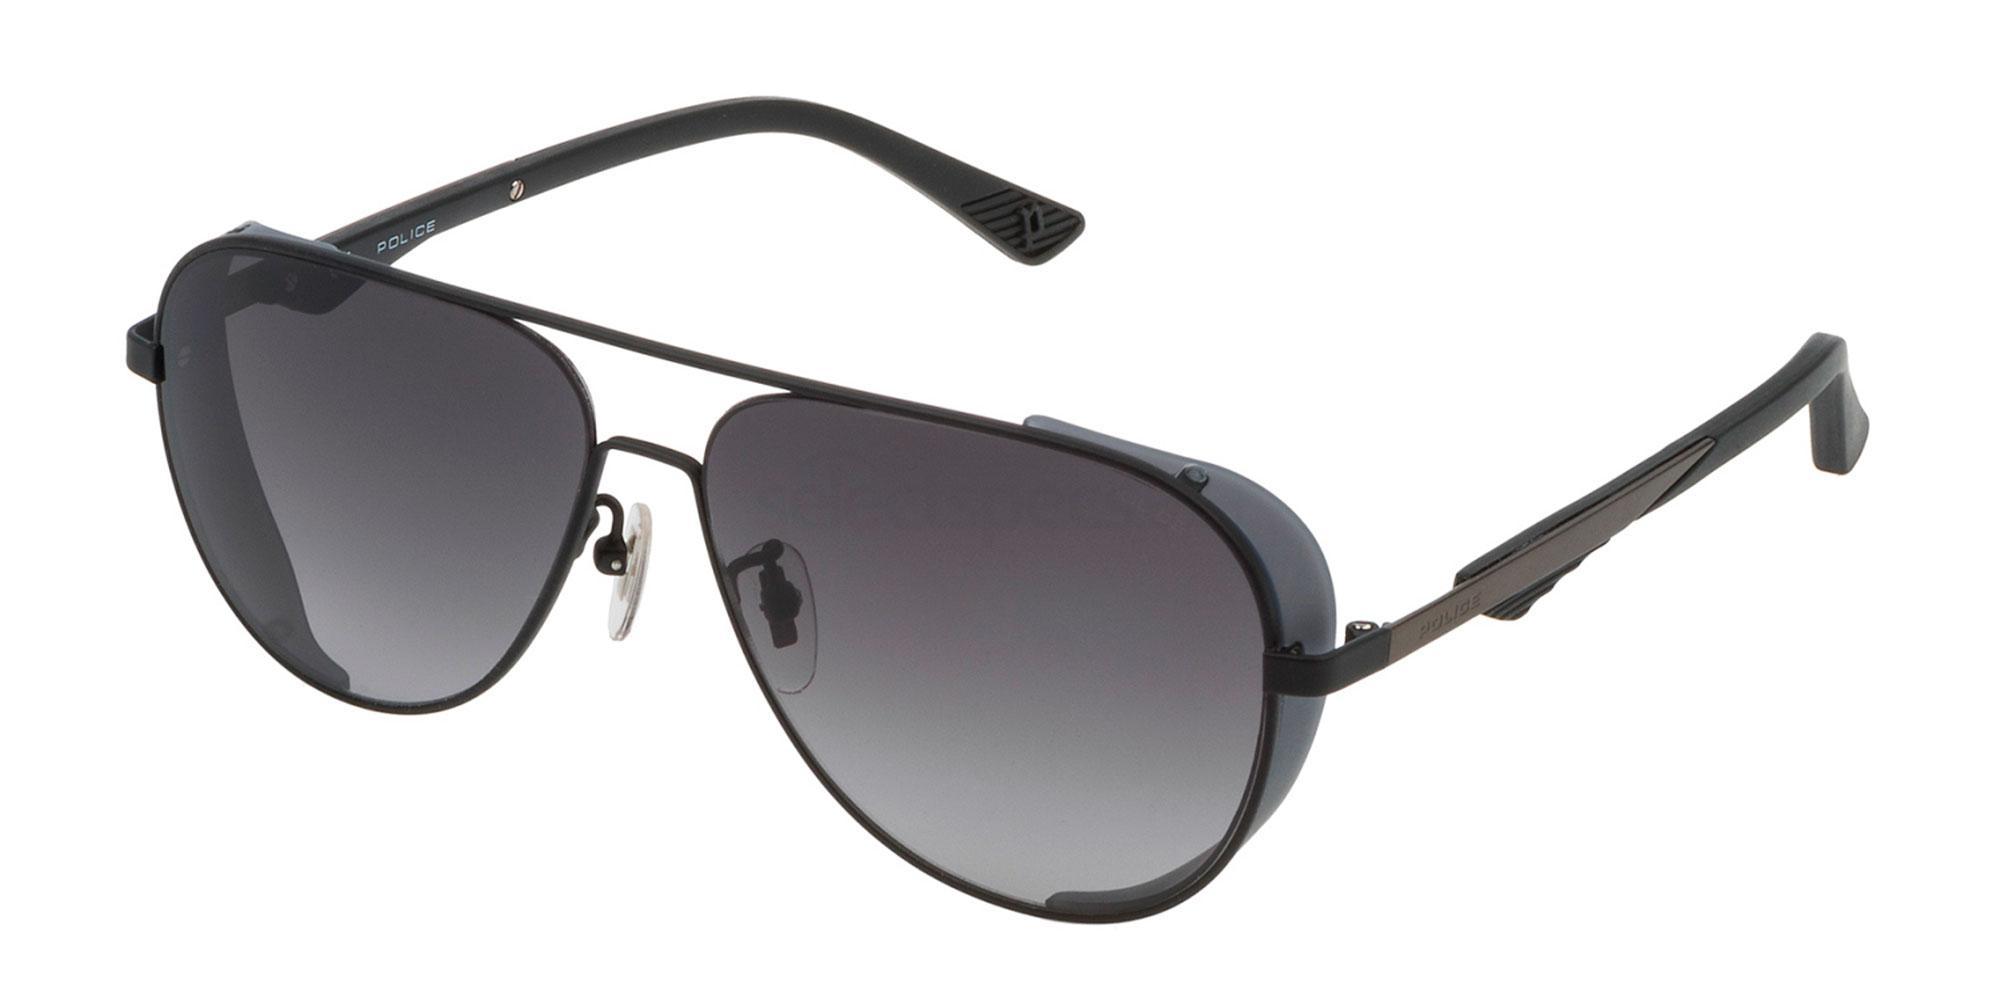 01HM SPL721 Sunglasses, Police